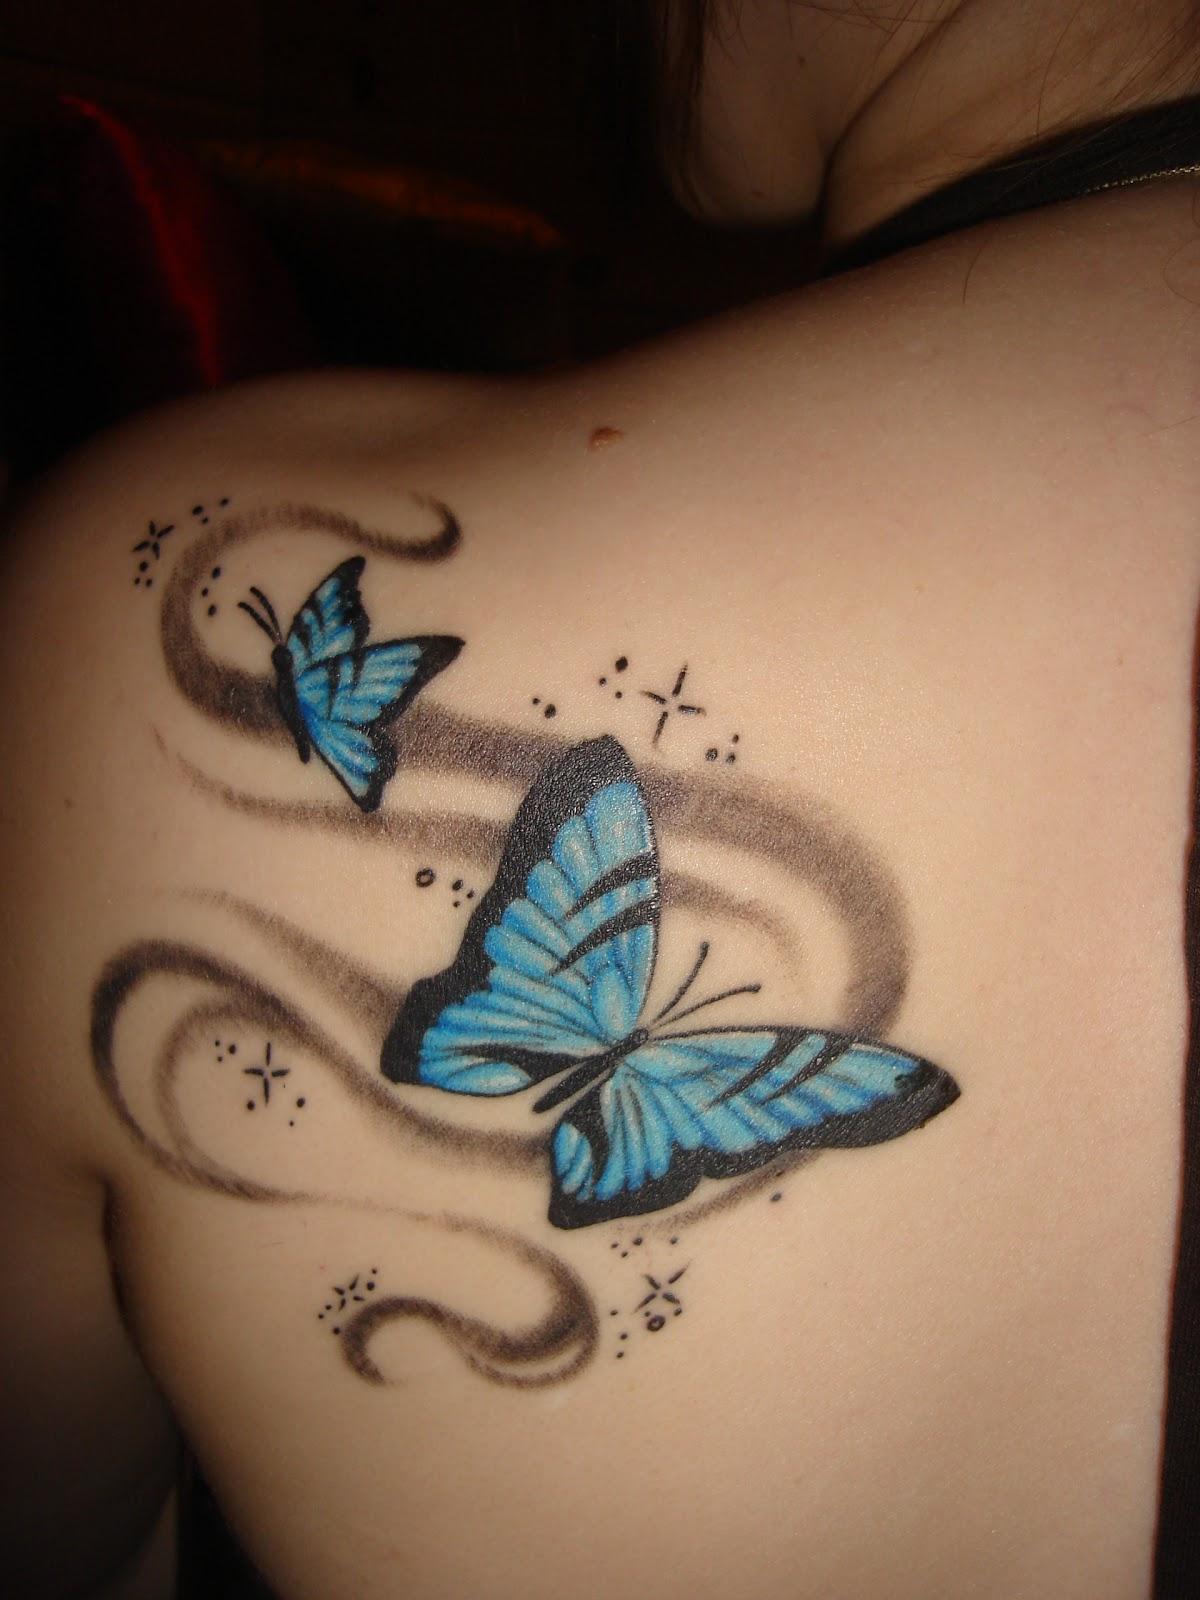 tatuaje mariposas azules fotos de tatuajes. Black Bedroom Furniture Sets. Home Design Ideas